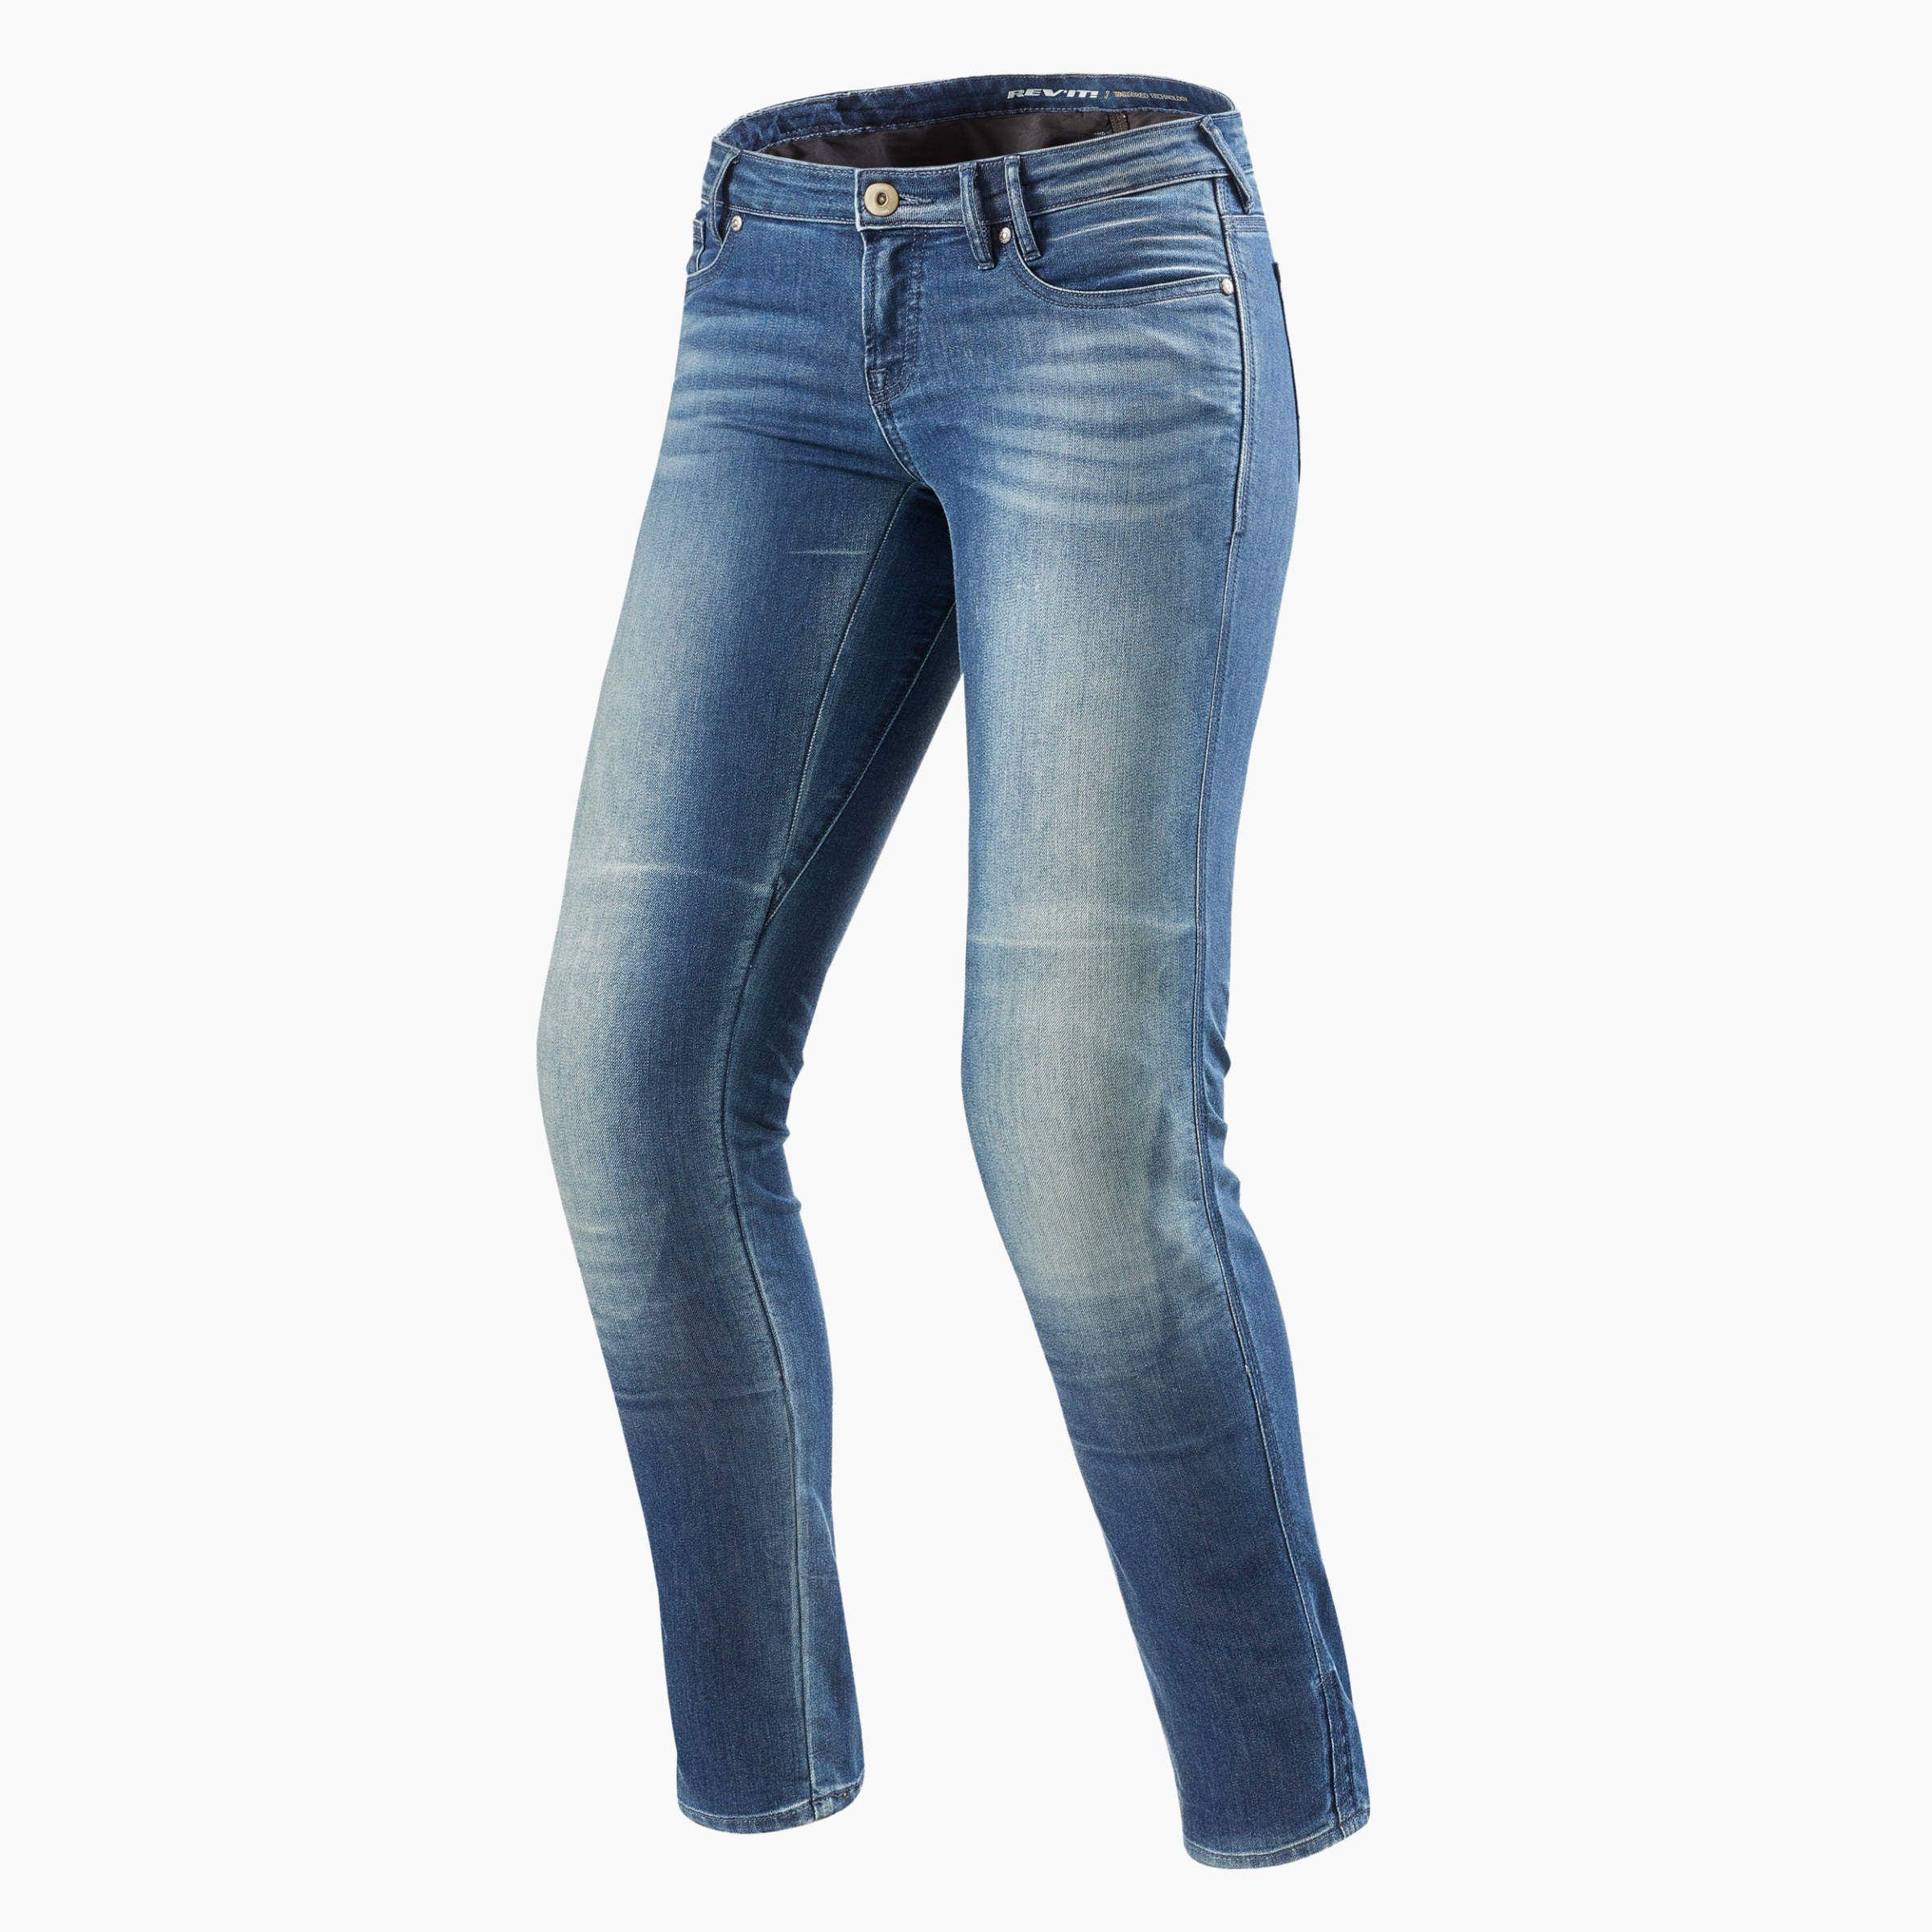 Revit Westwood Ladies Jeans